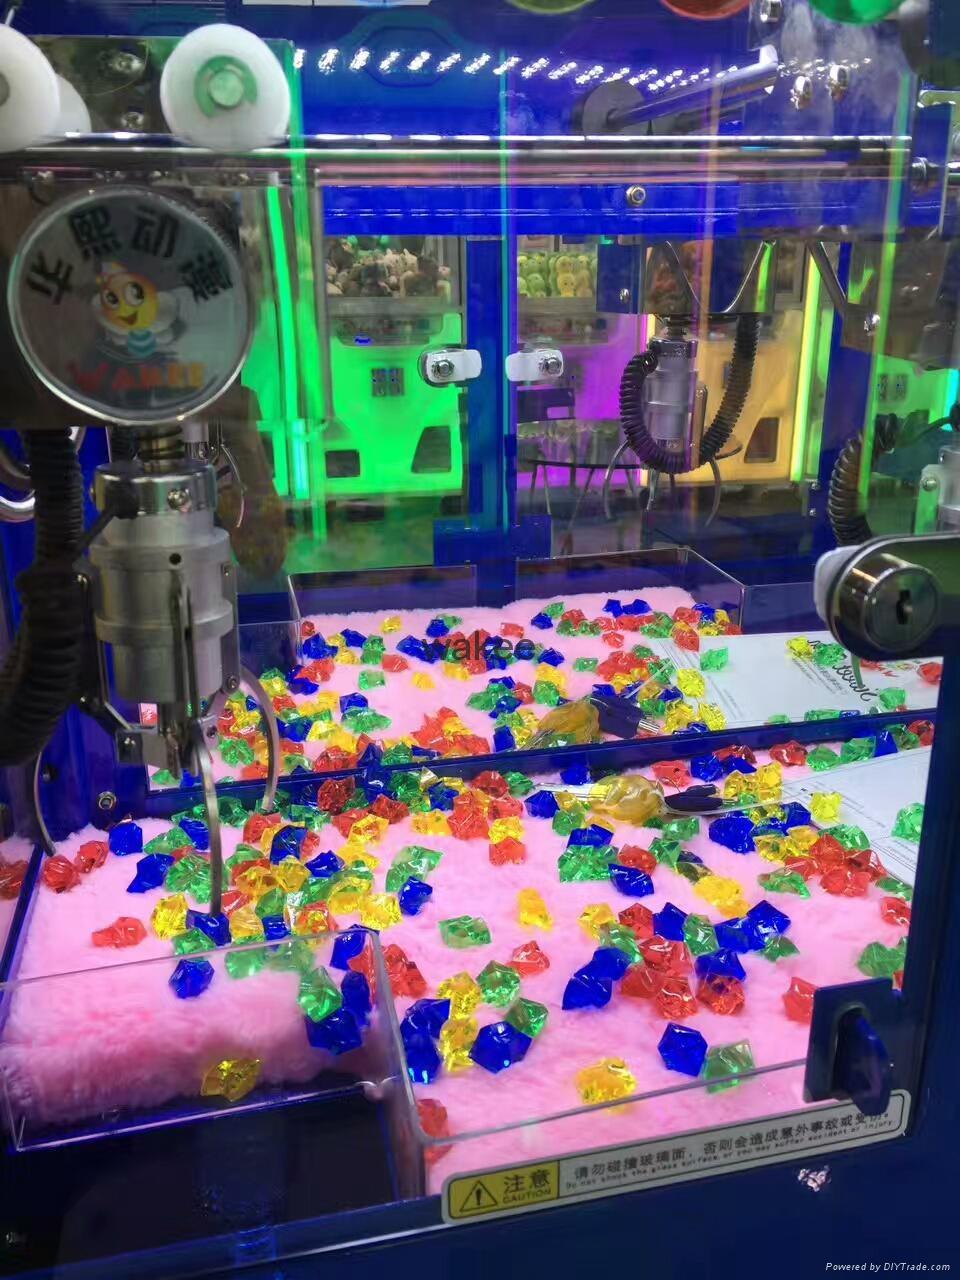 2017 candy slot machine arcade game Magic House doll coin pusher machine for kid 2